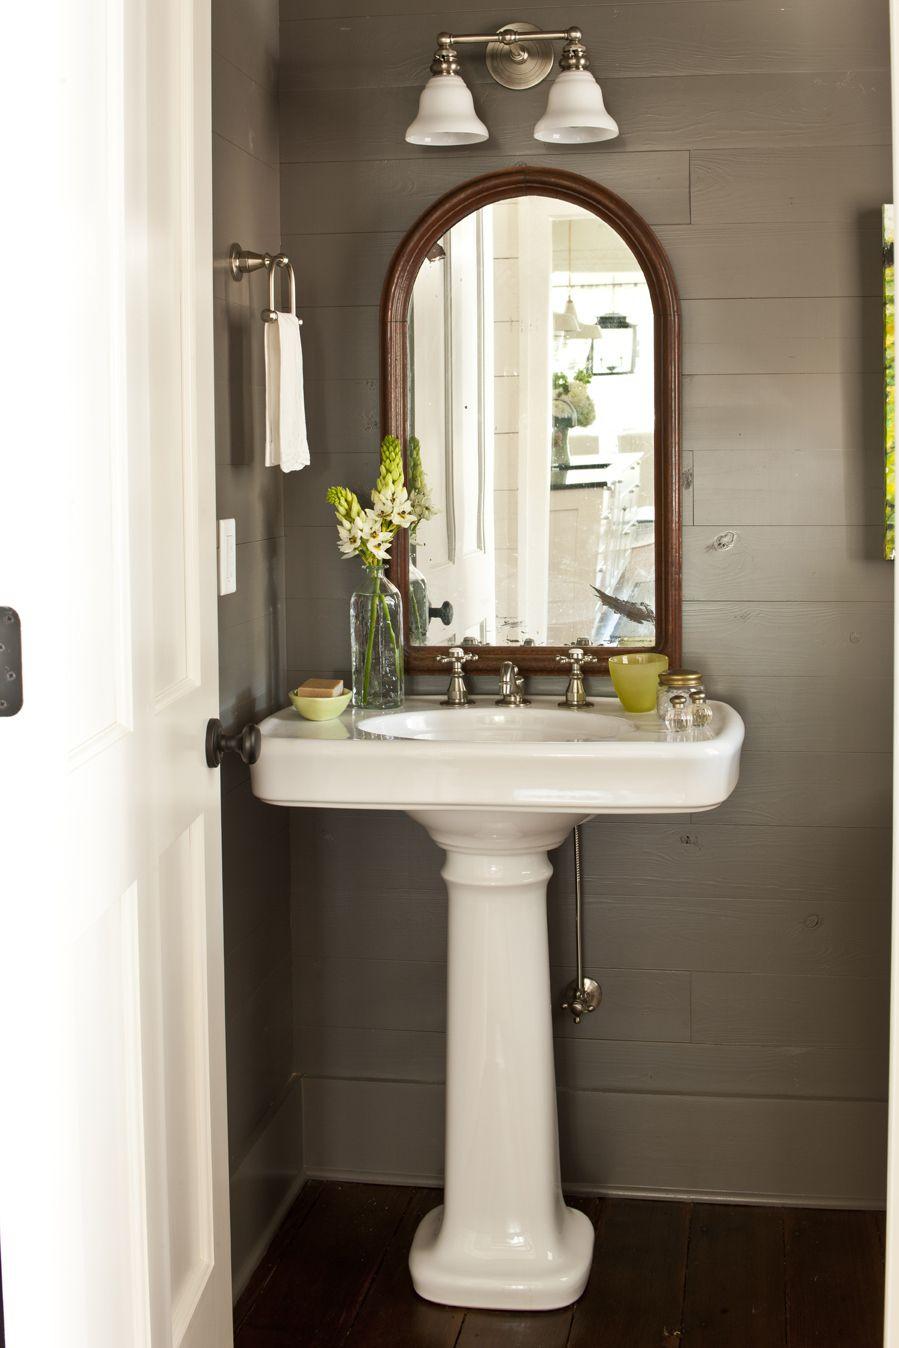 Lighting Basement Washroom Stairs: Mirrors And Lights. ? Under Stairs Bathroom